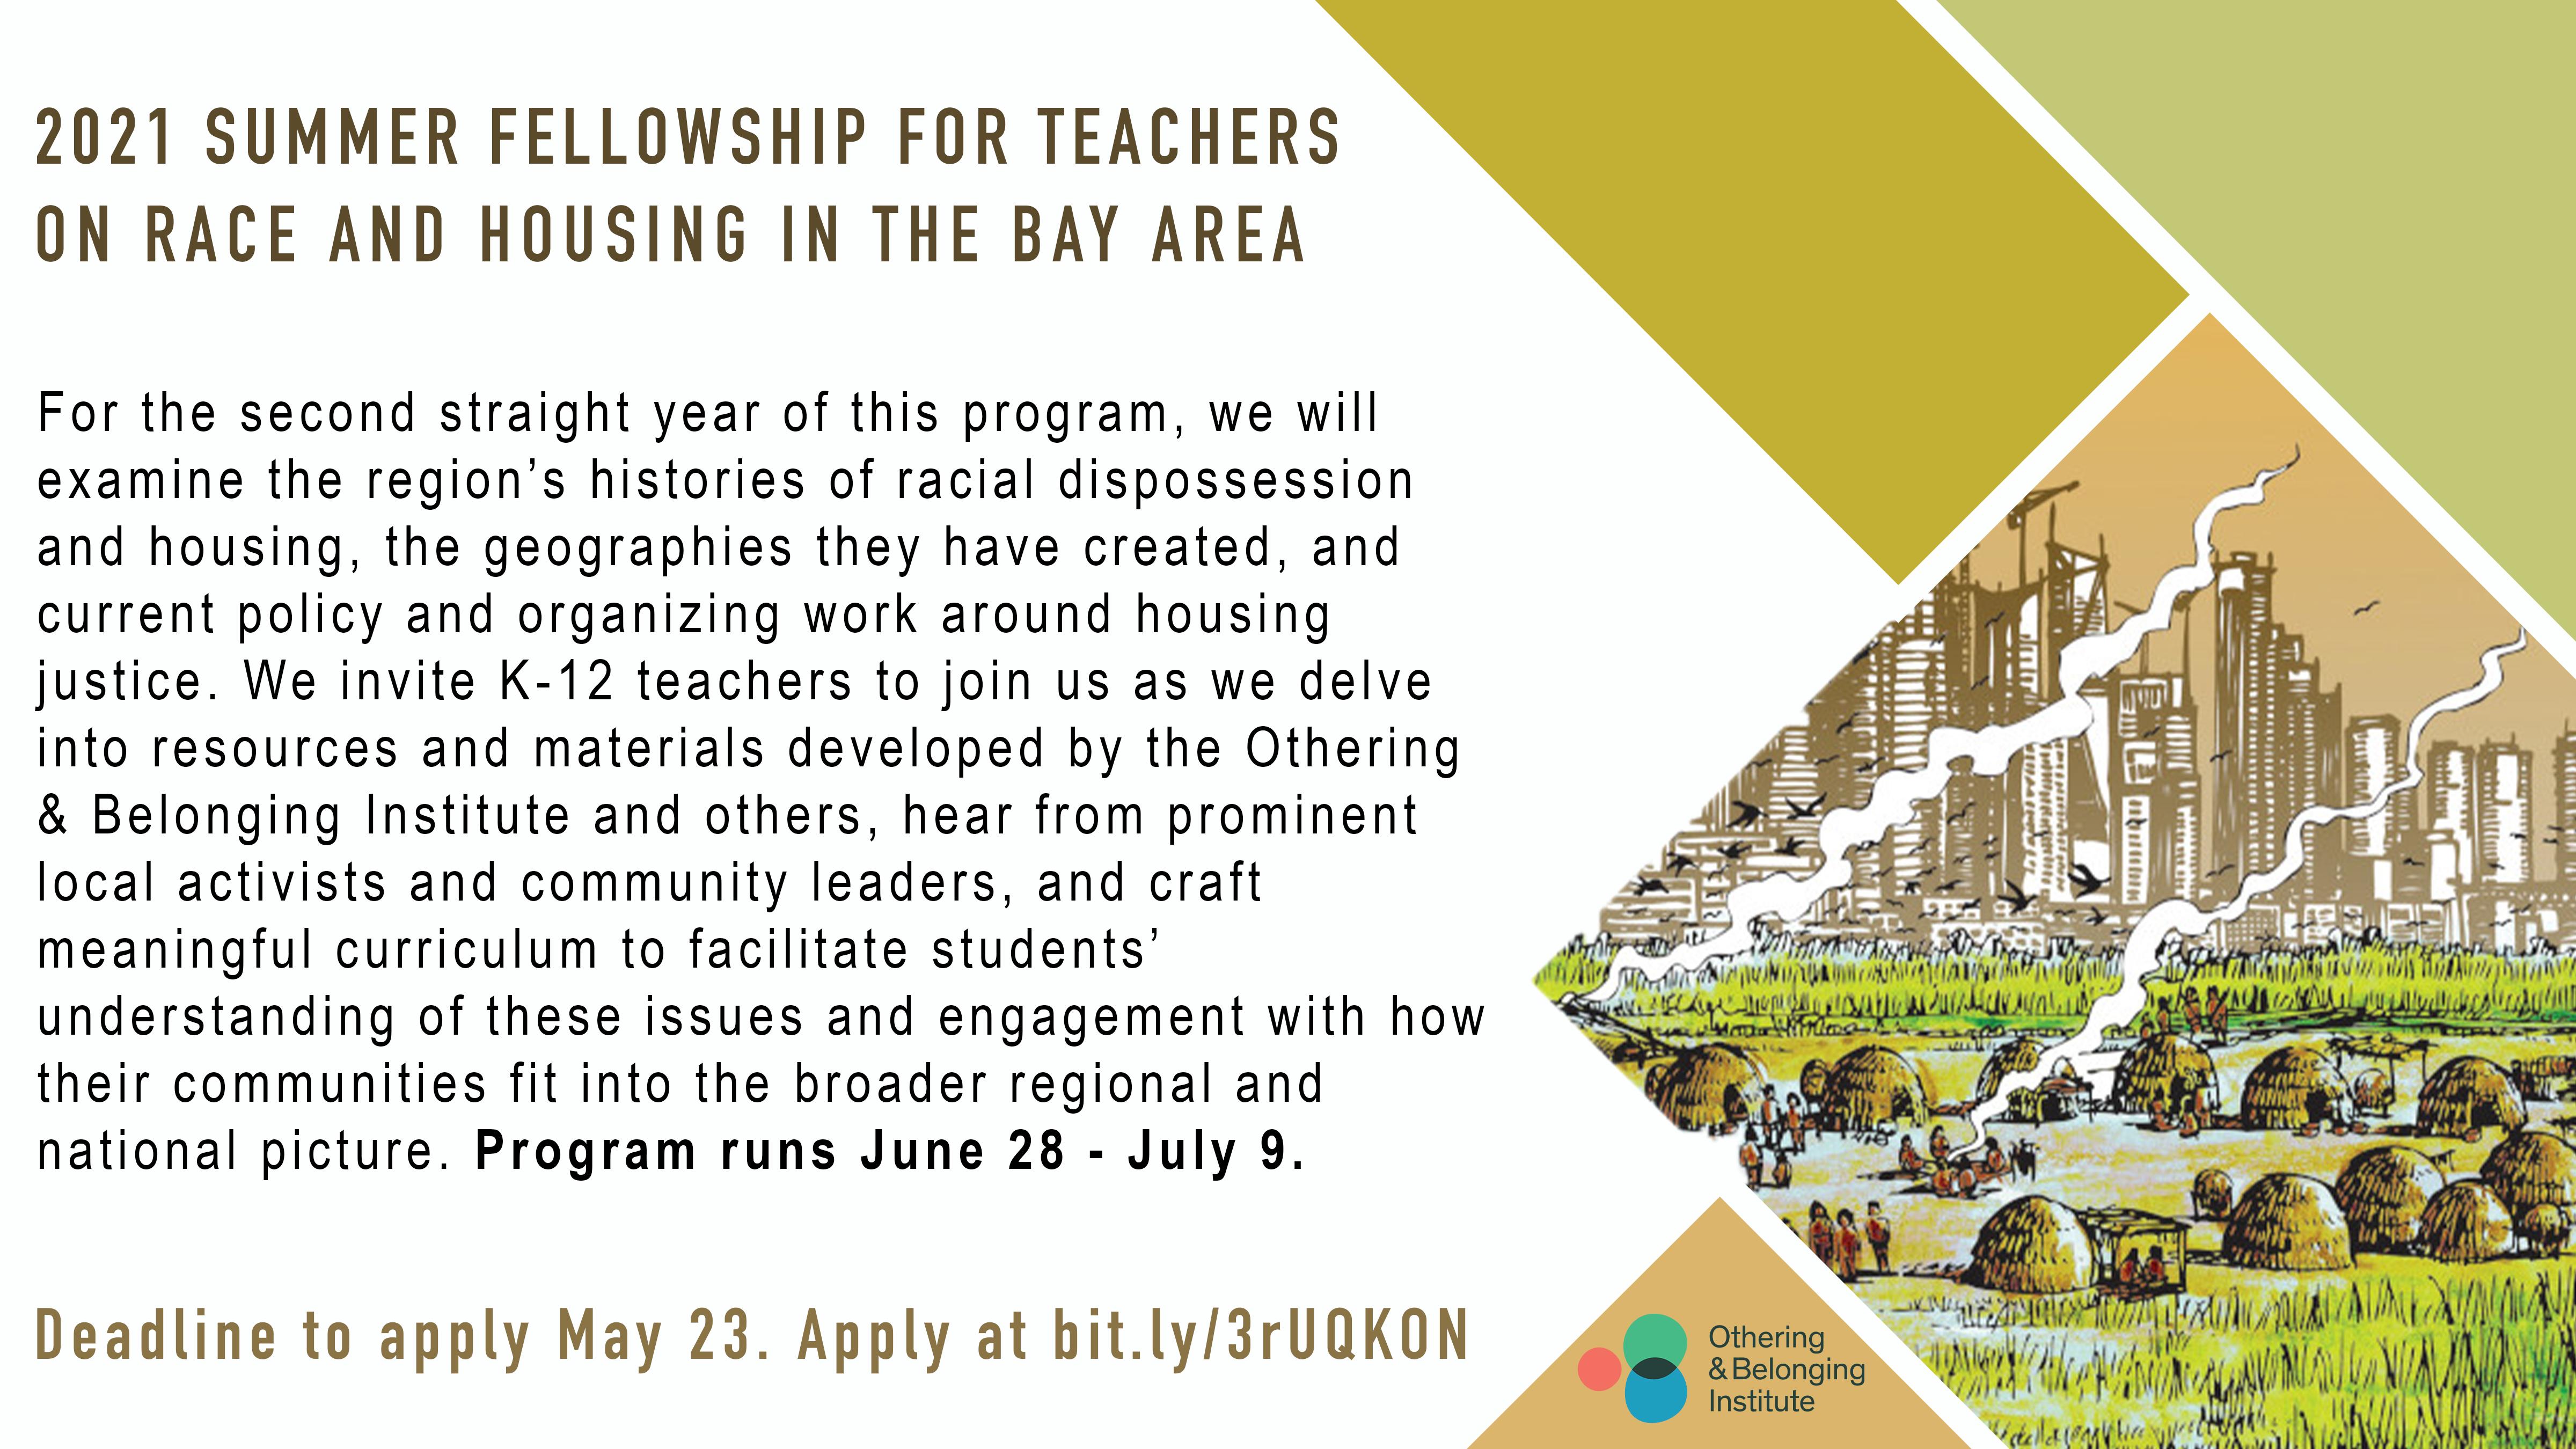 Promo card for our 2021 summer fellowship for teachers